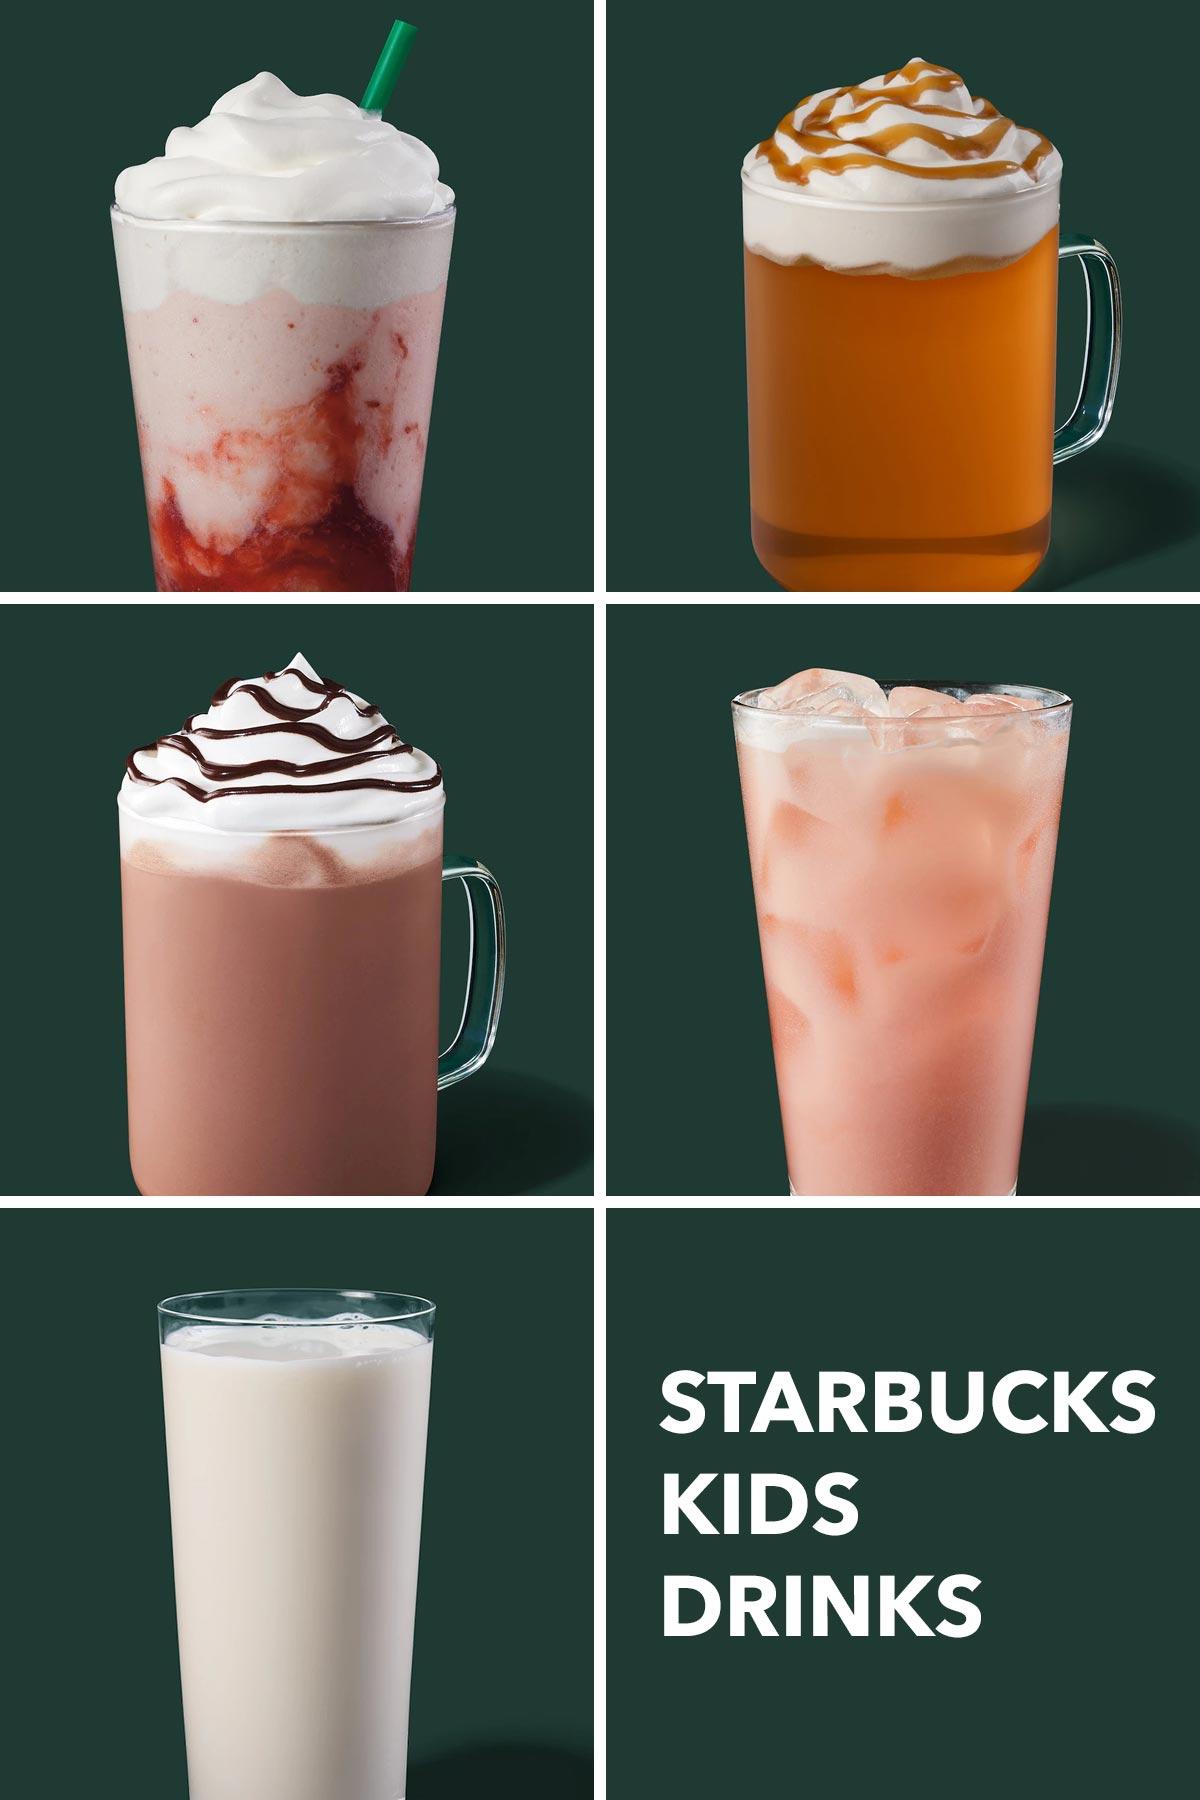 Five drink photos showing kid-friendly Starbucks drinks.